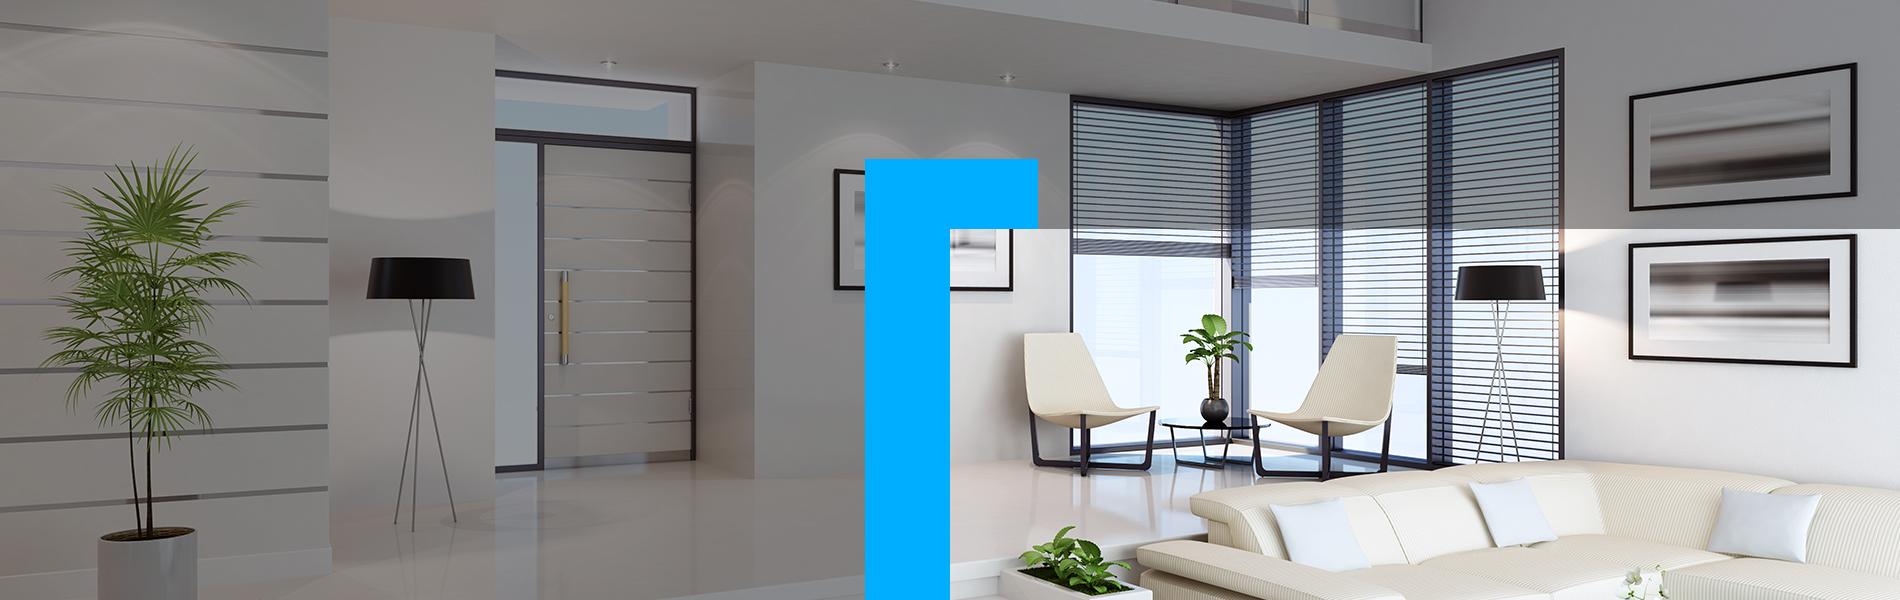 Azurenov - Pose de fenêtres - HEADER